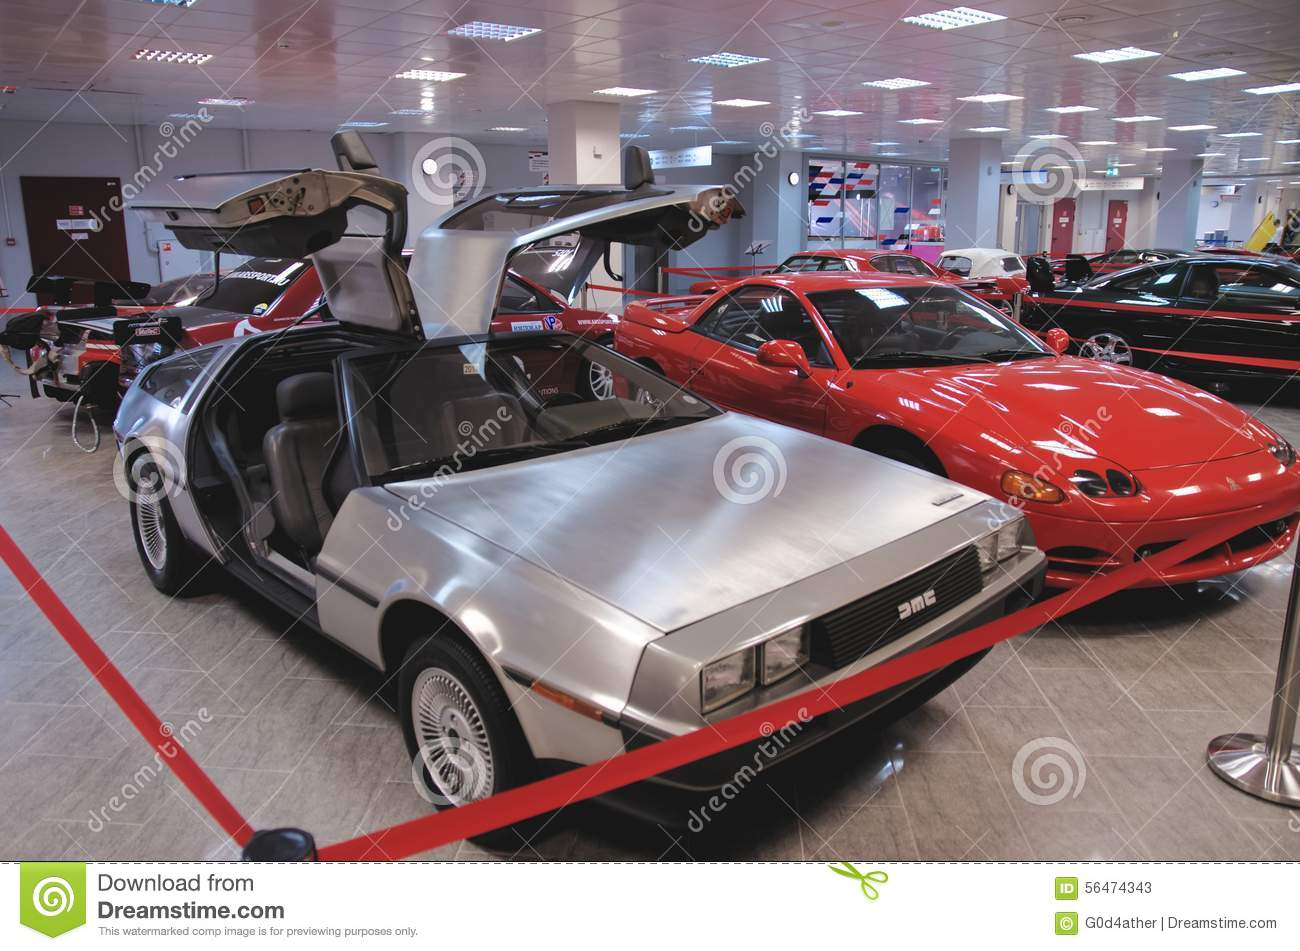 A DeLorean DMC.